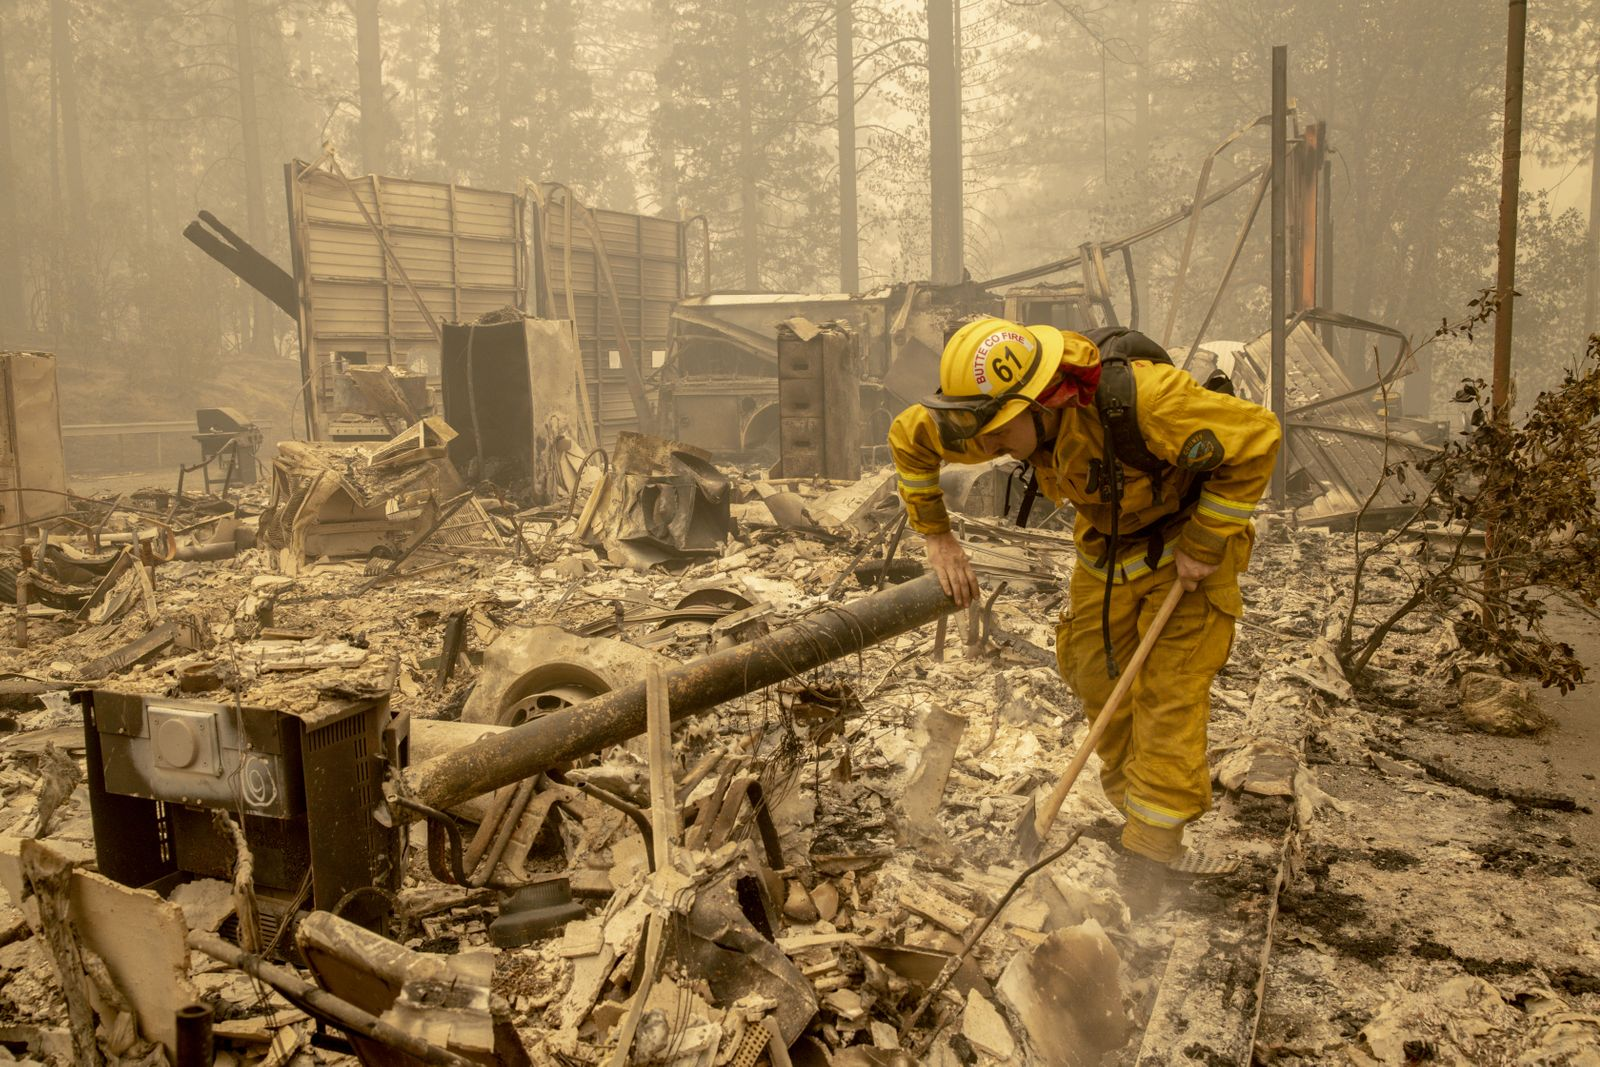 Bear Fire in California, Berry Creek, USA - 12 Sep 2020